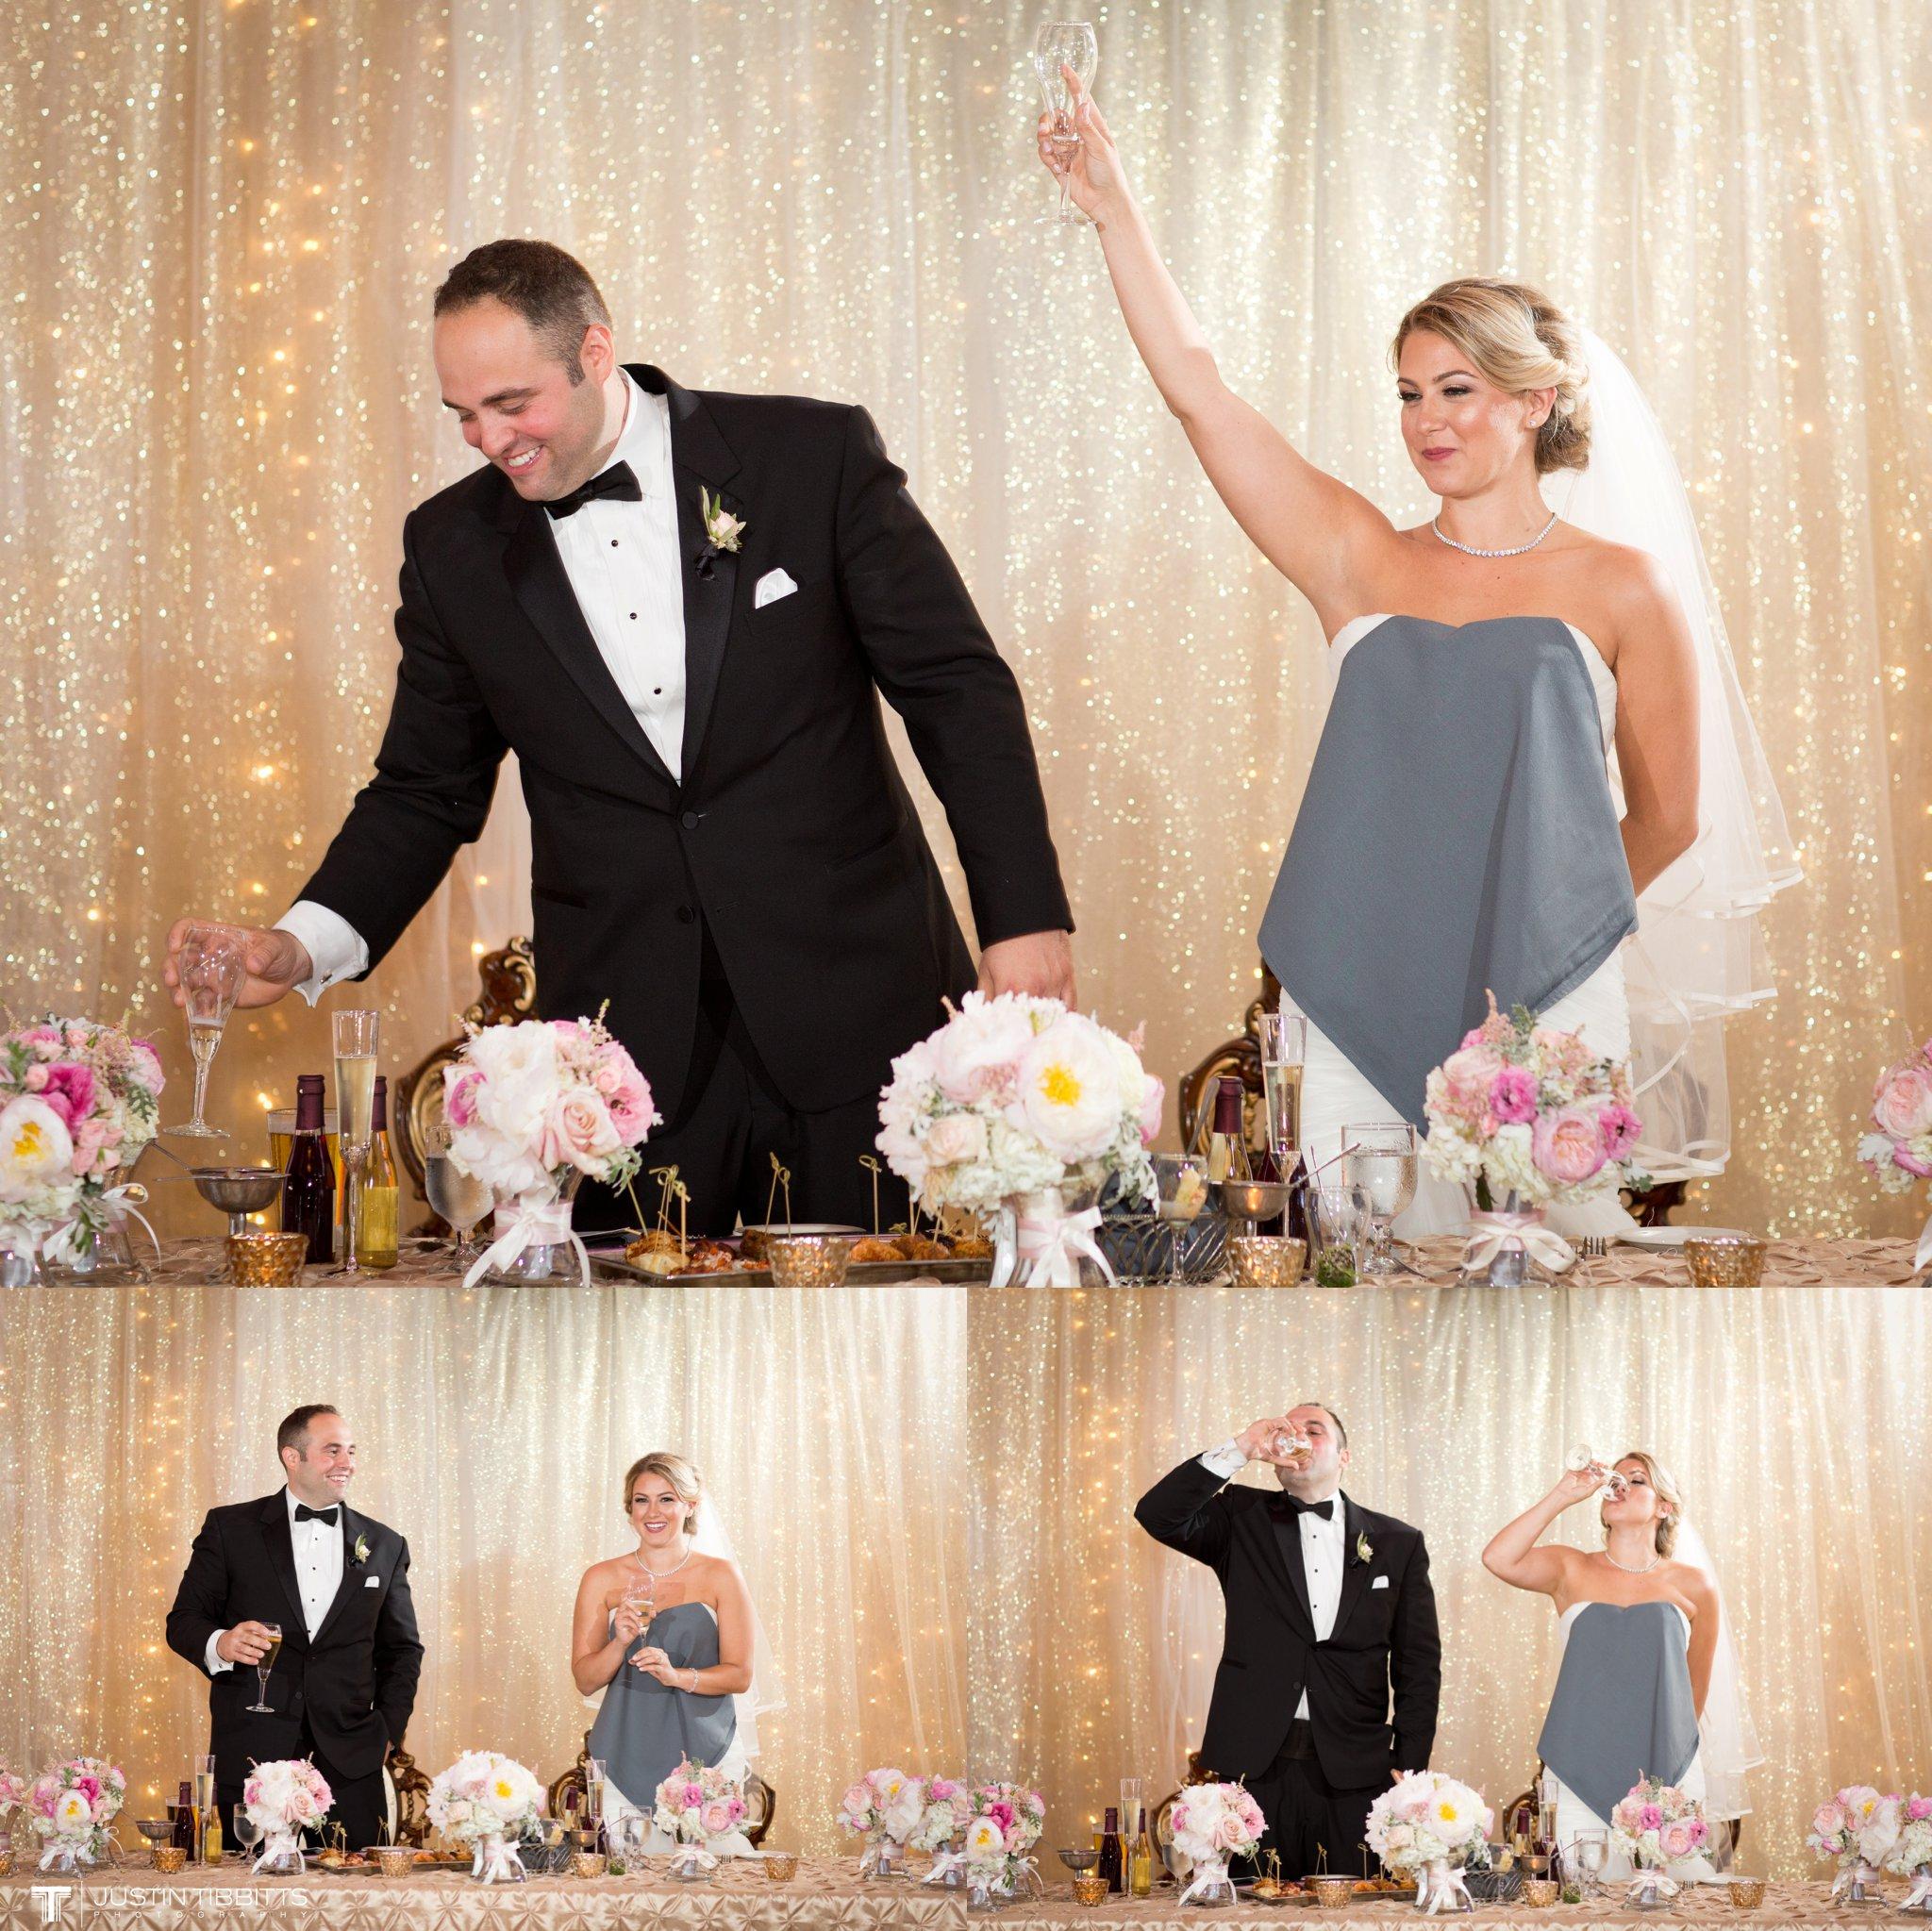 state-room-wedding-photos-with-amanda-and-nick_0167